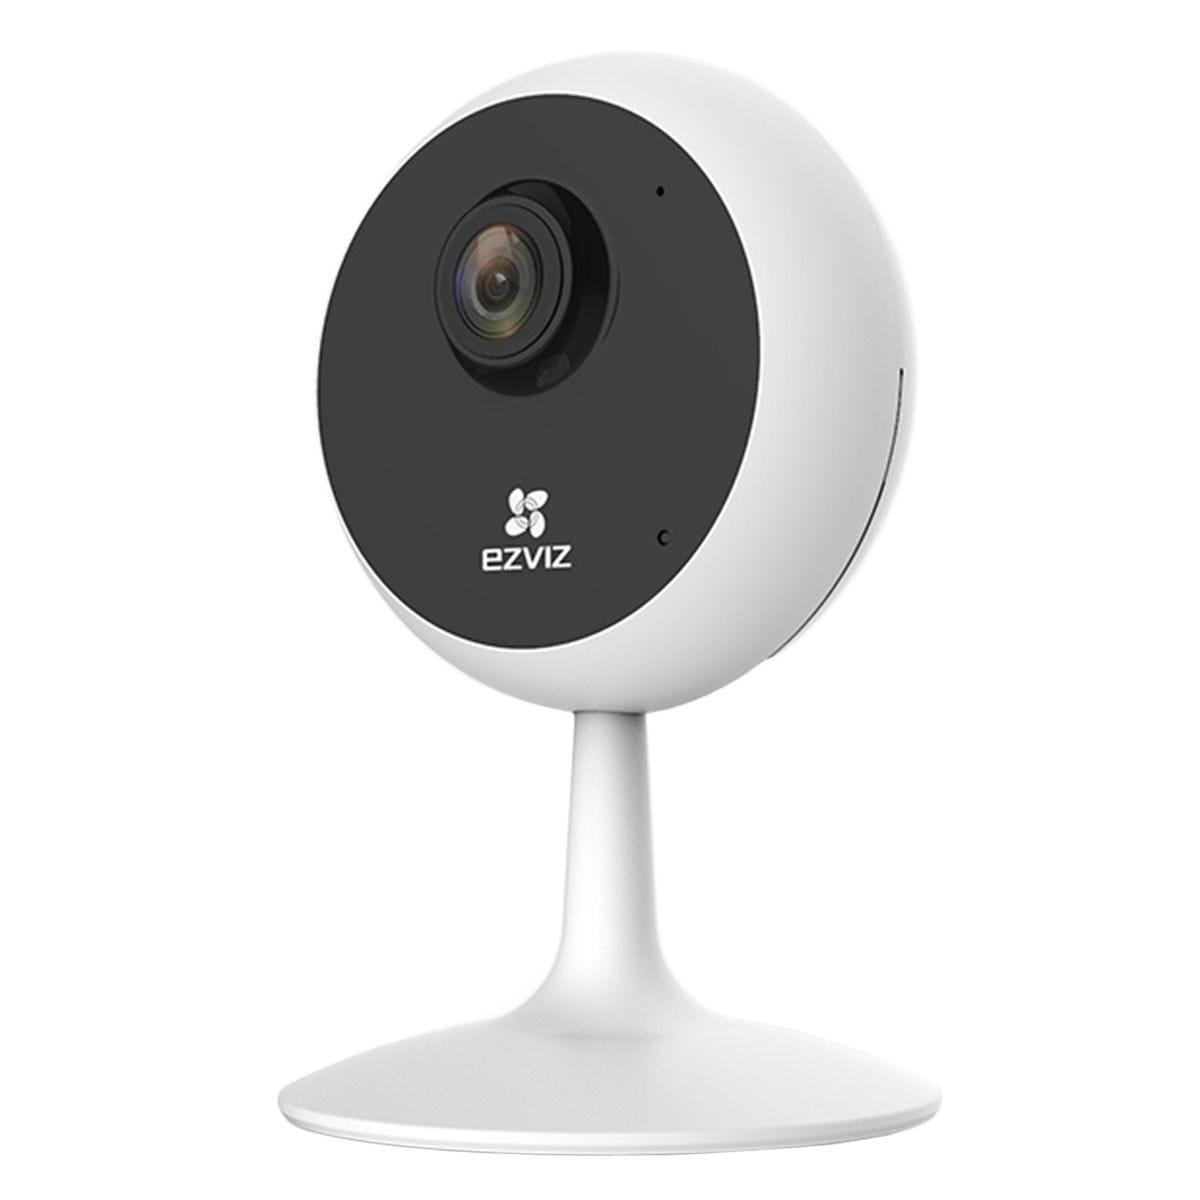 EZVIZ HD 720p Wi-Fi Indoor Smart Security Camera